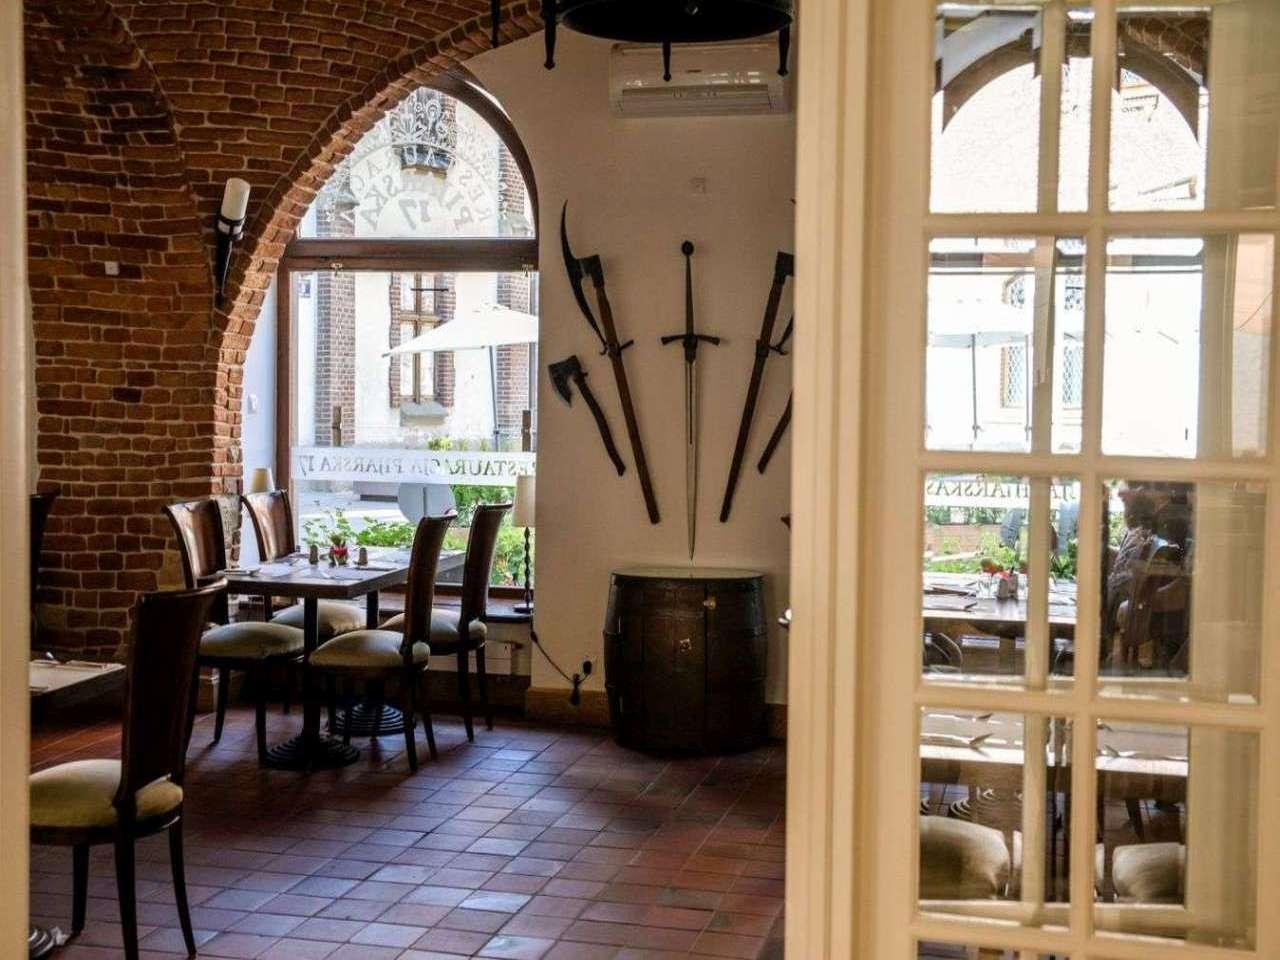 Hotel Polski - Restauracja - Restauracja Pijarska 17